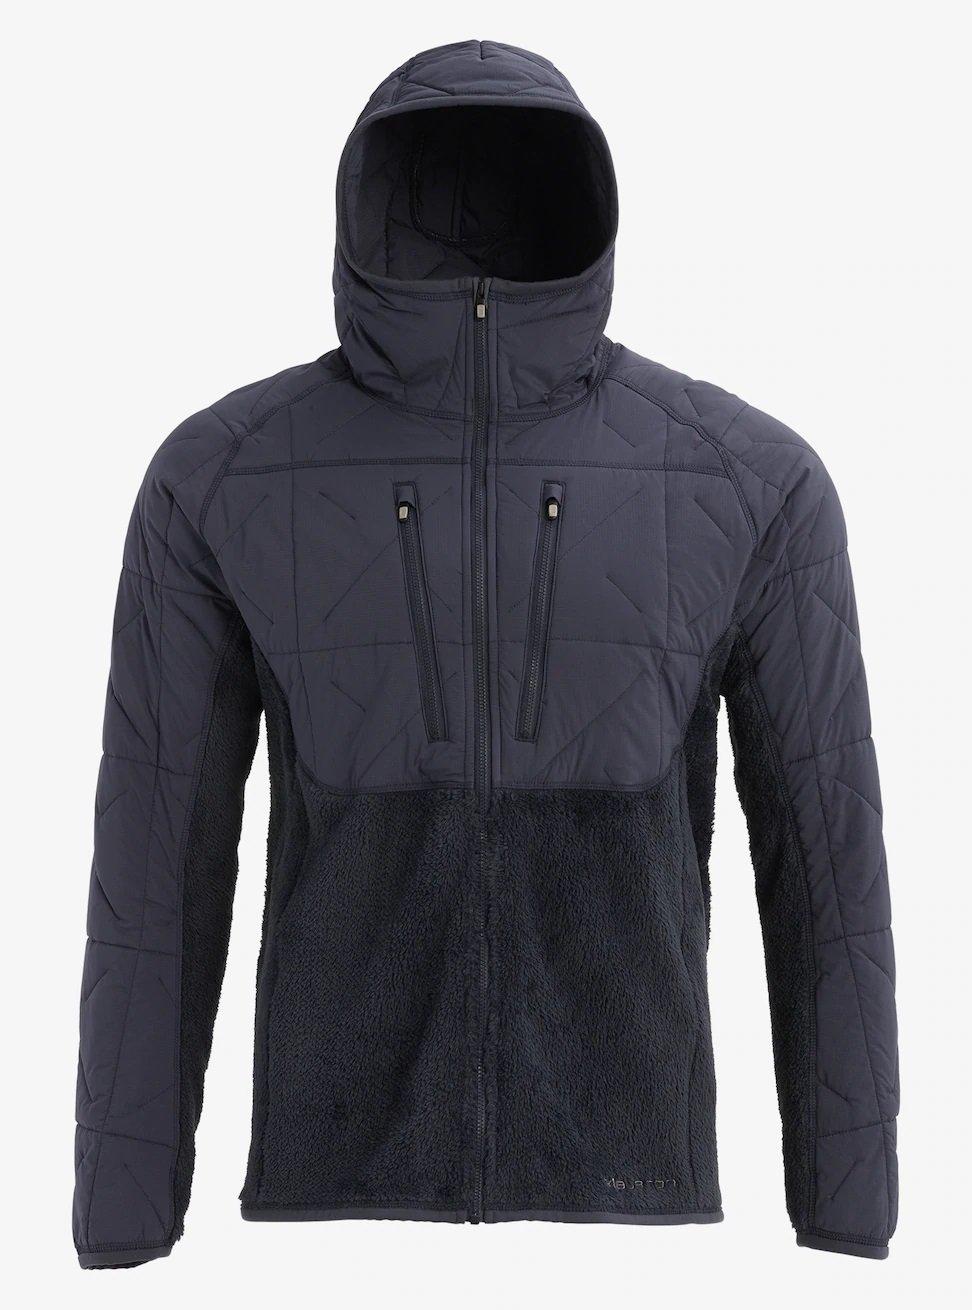 Burton AK Cavu Hybrid Insulator Jacket Black 2020